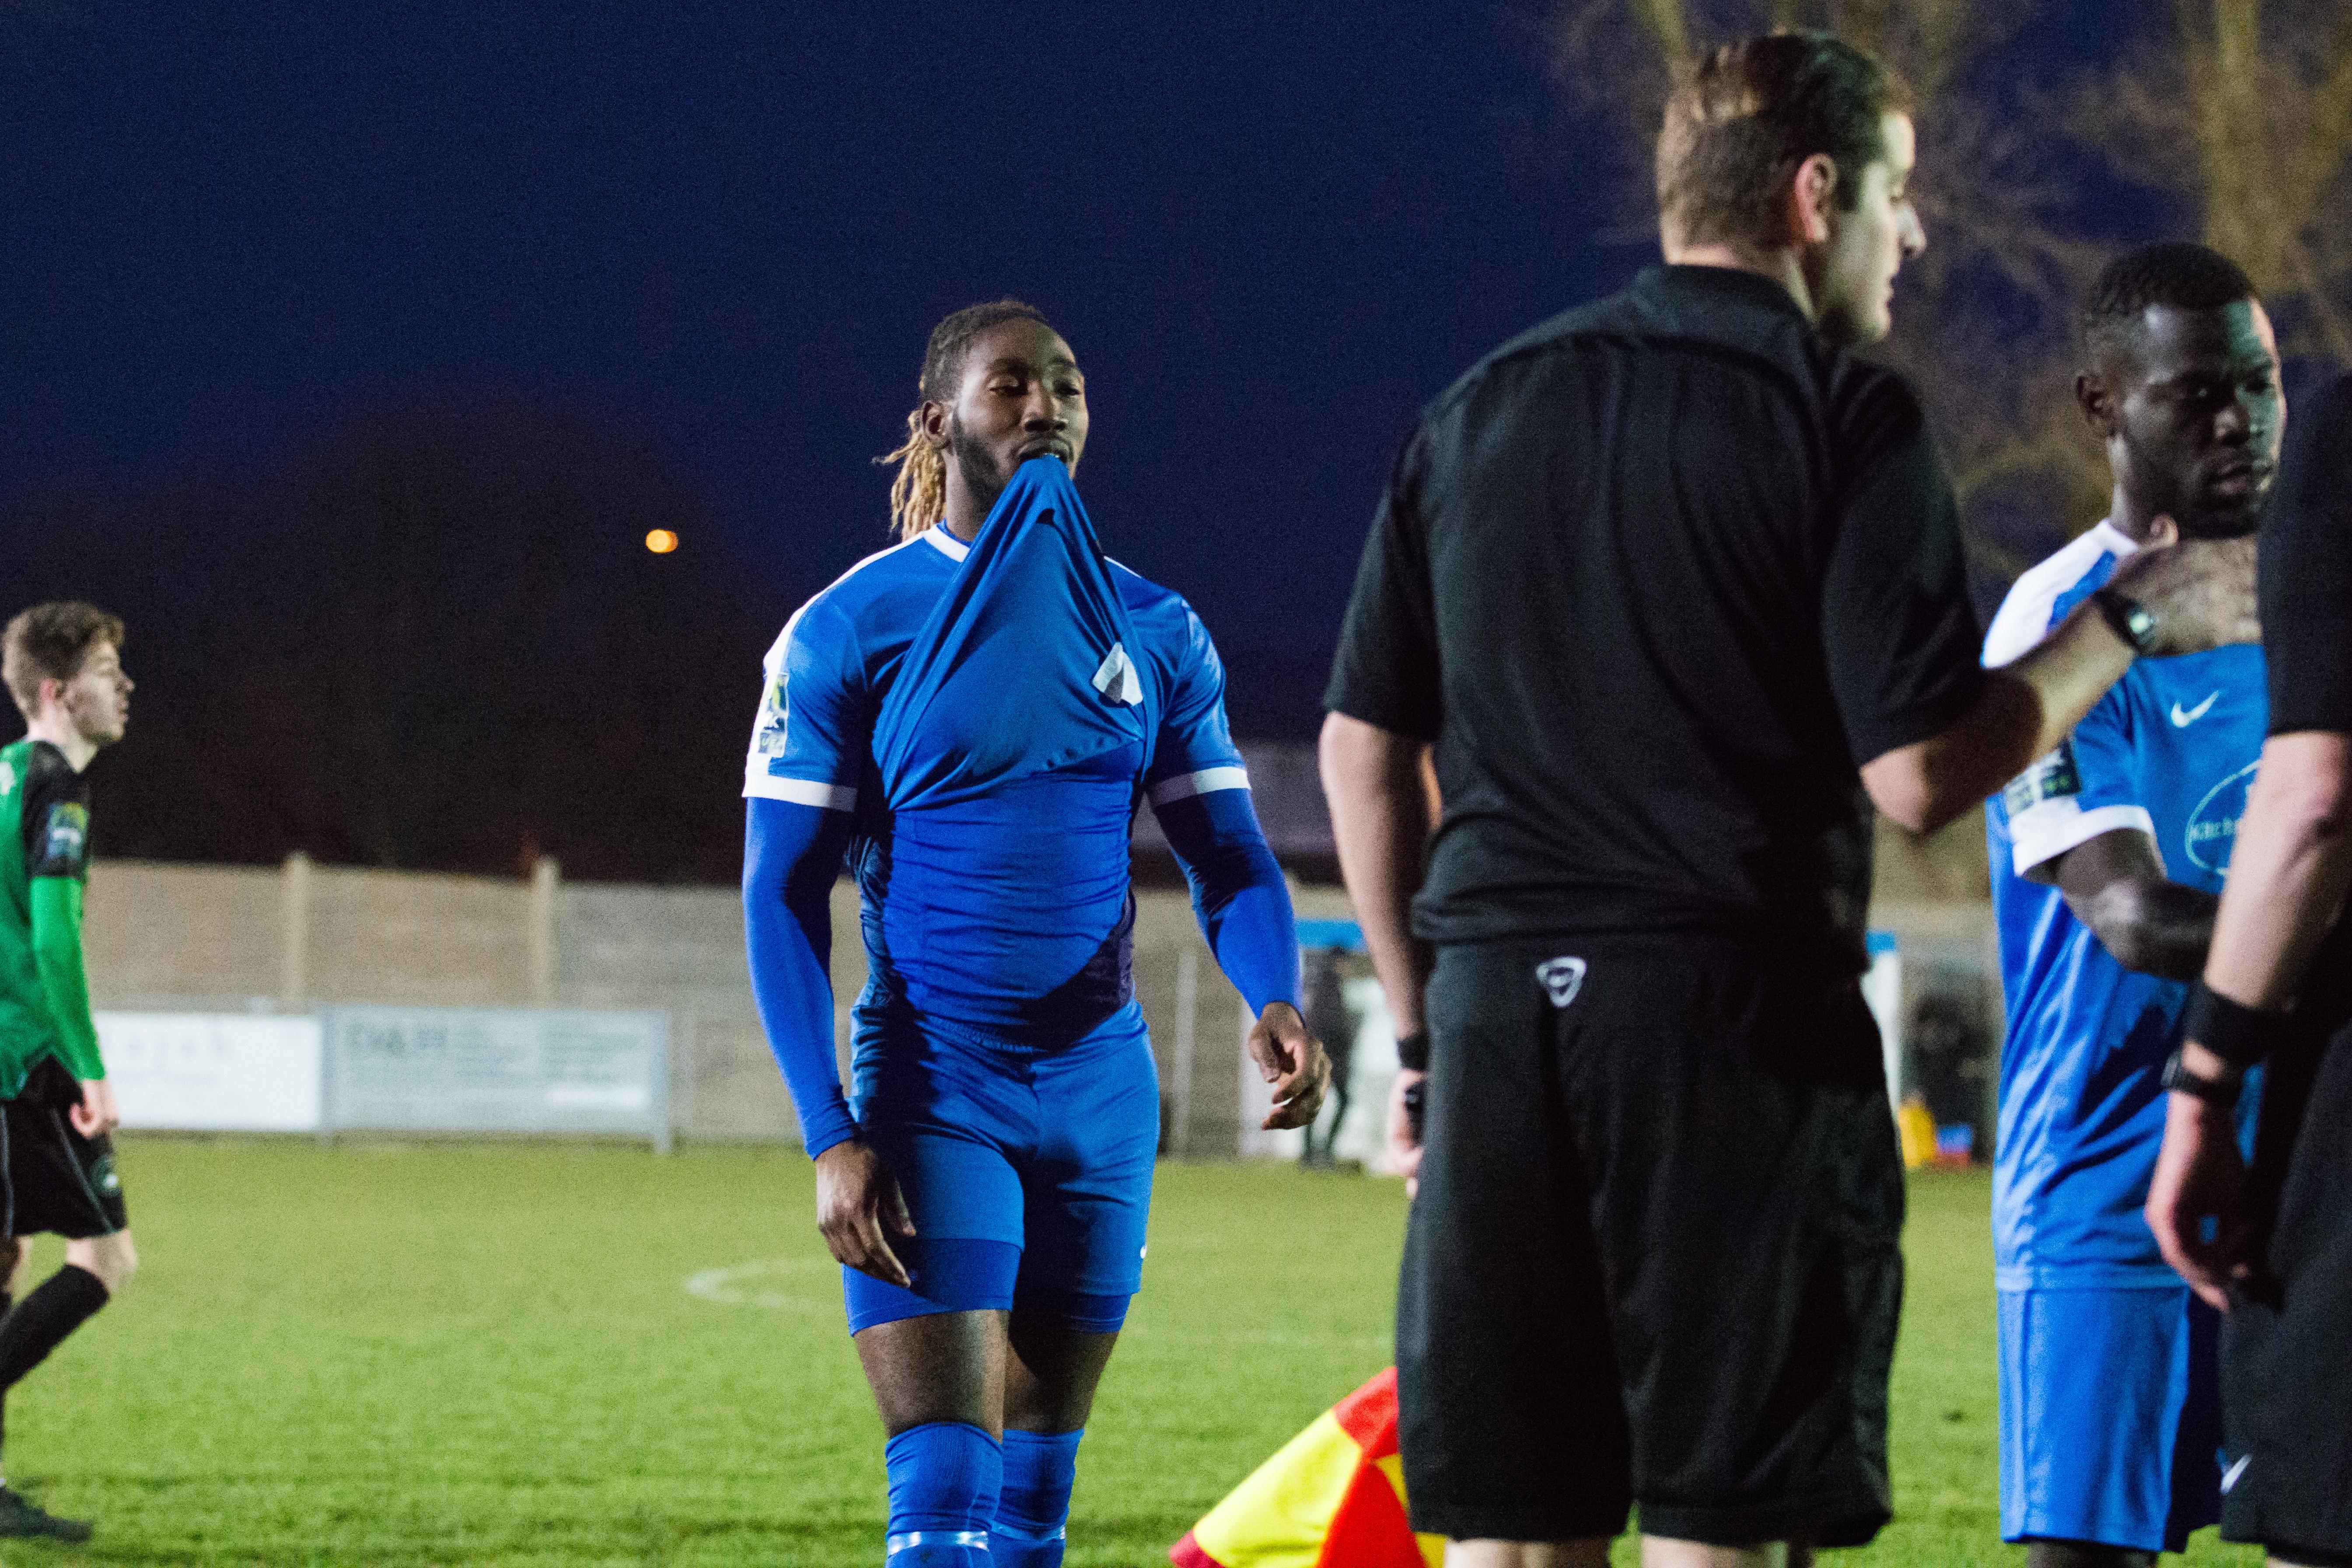 Shoreham FC vs Phoenix Sports 13.01.18 55